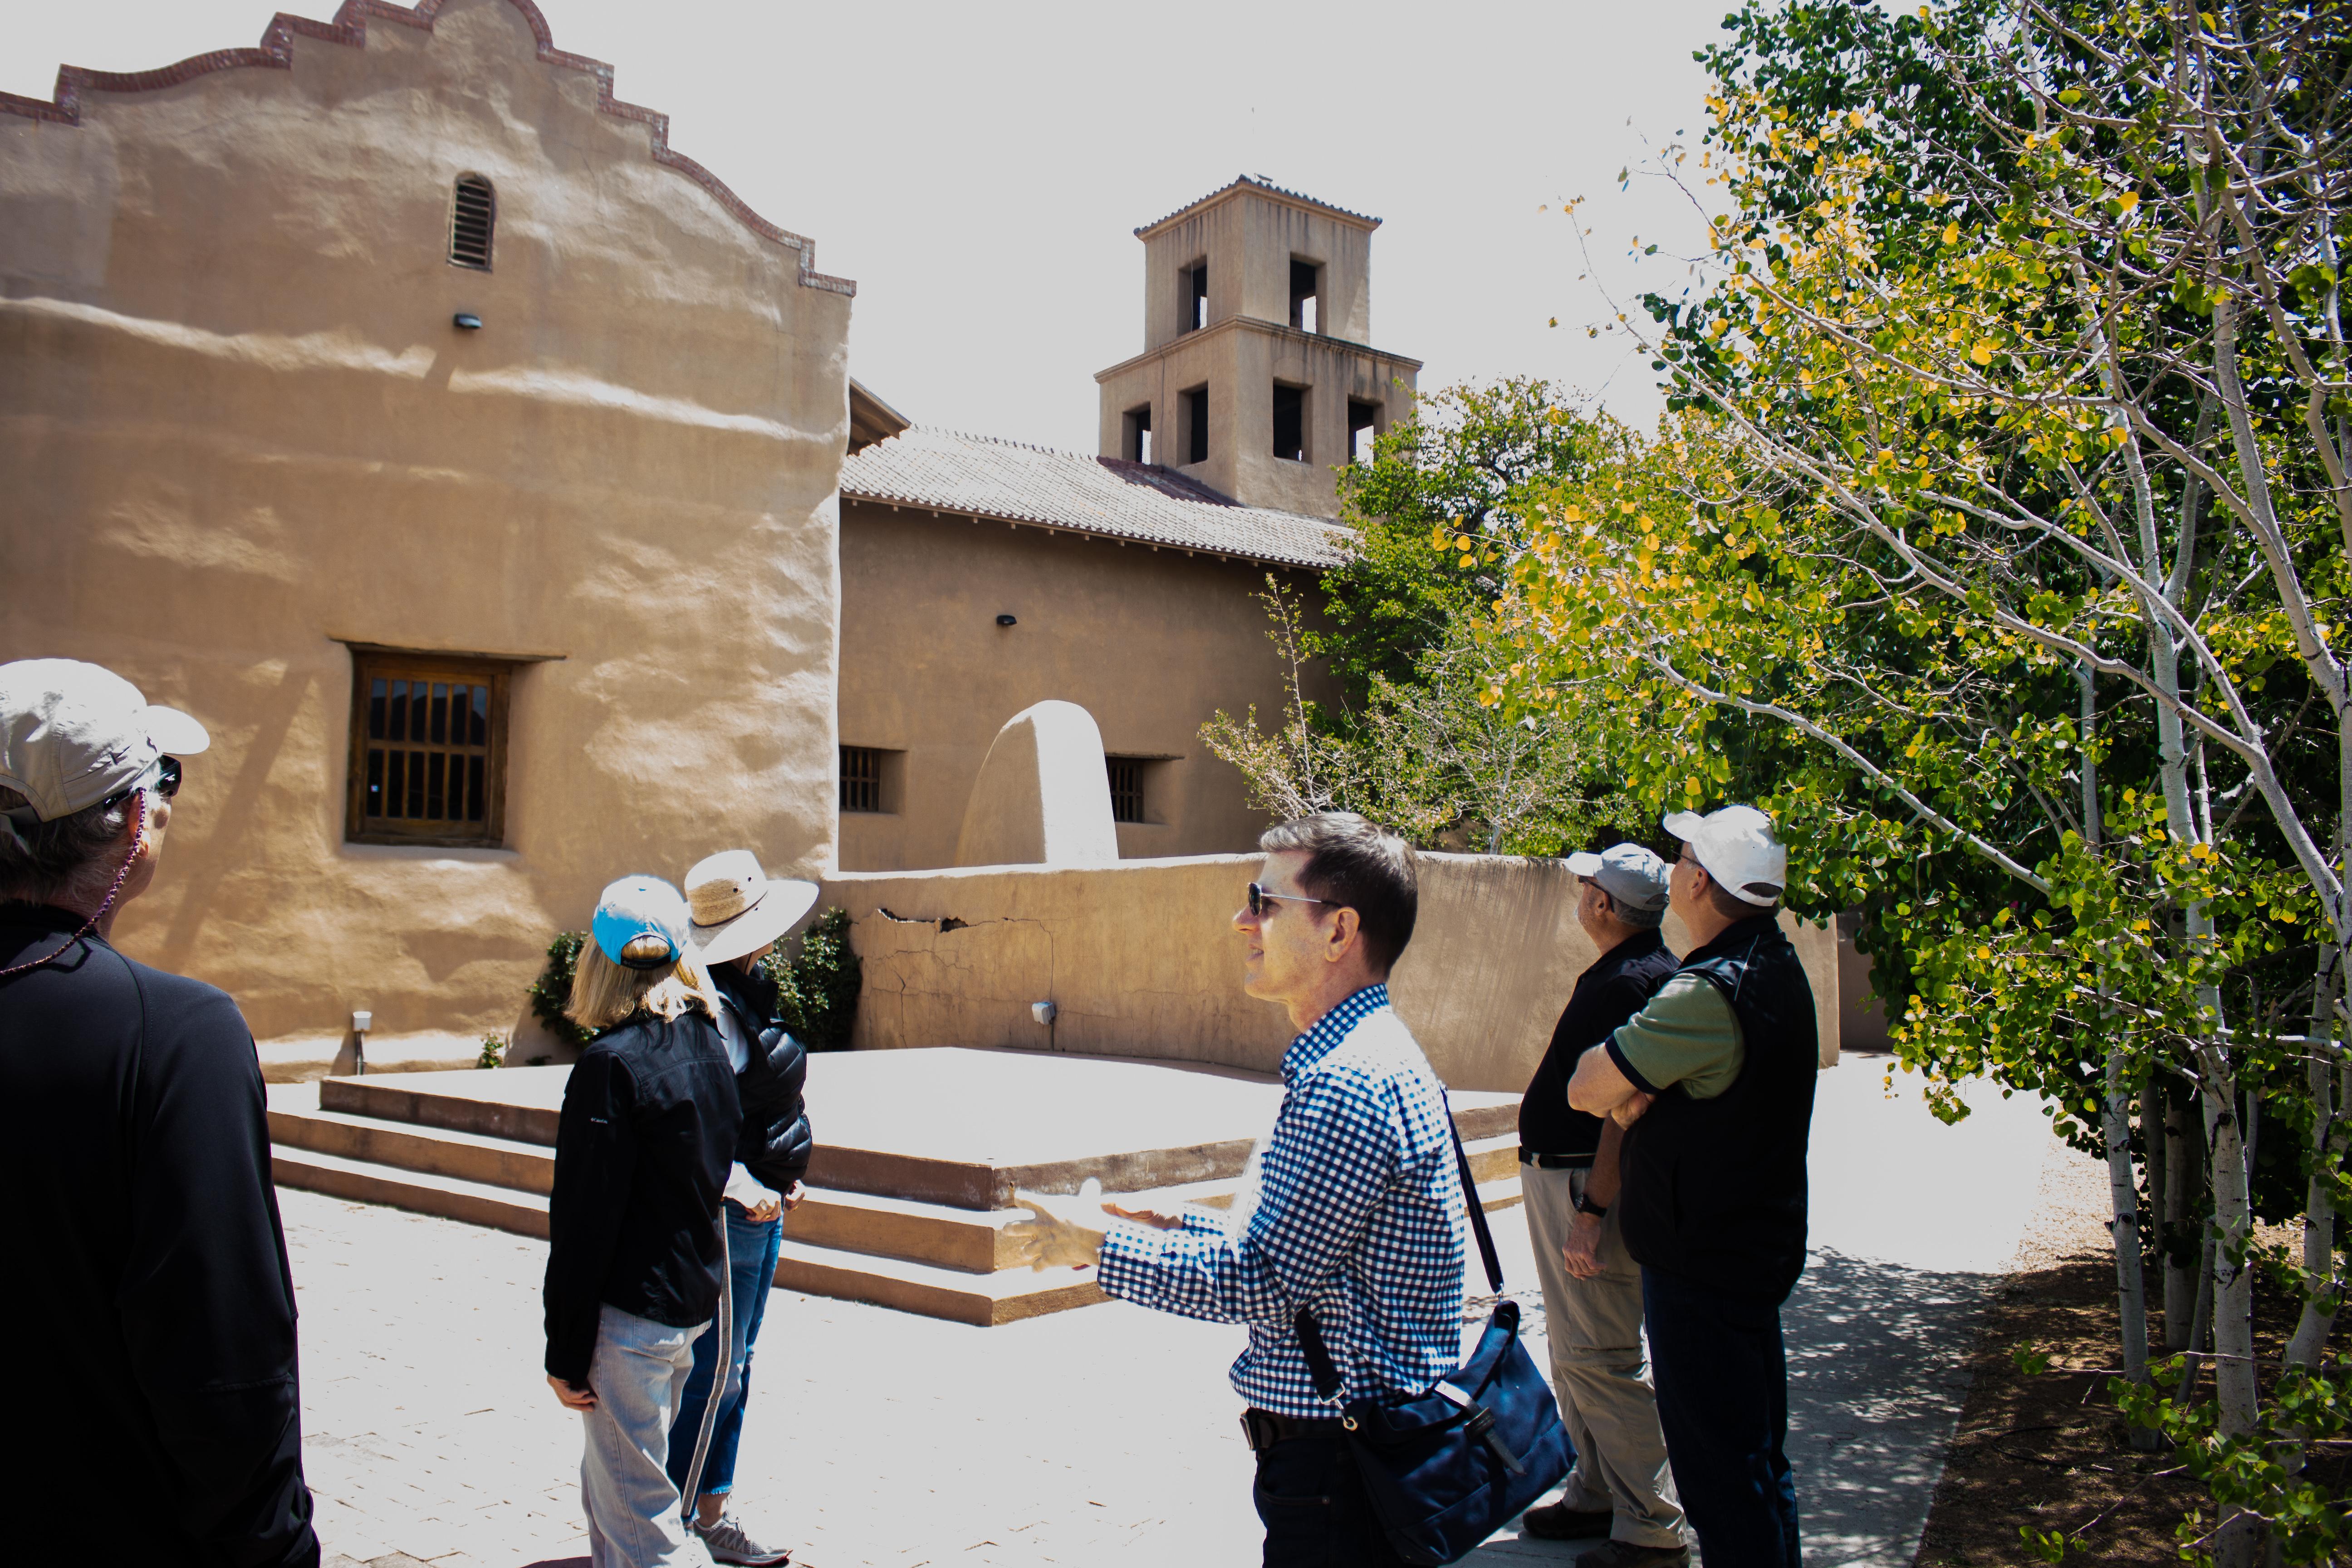 Exploring the Santuario de Guadalupe